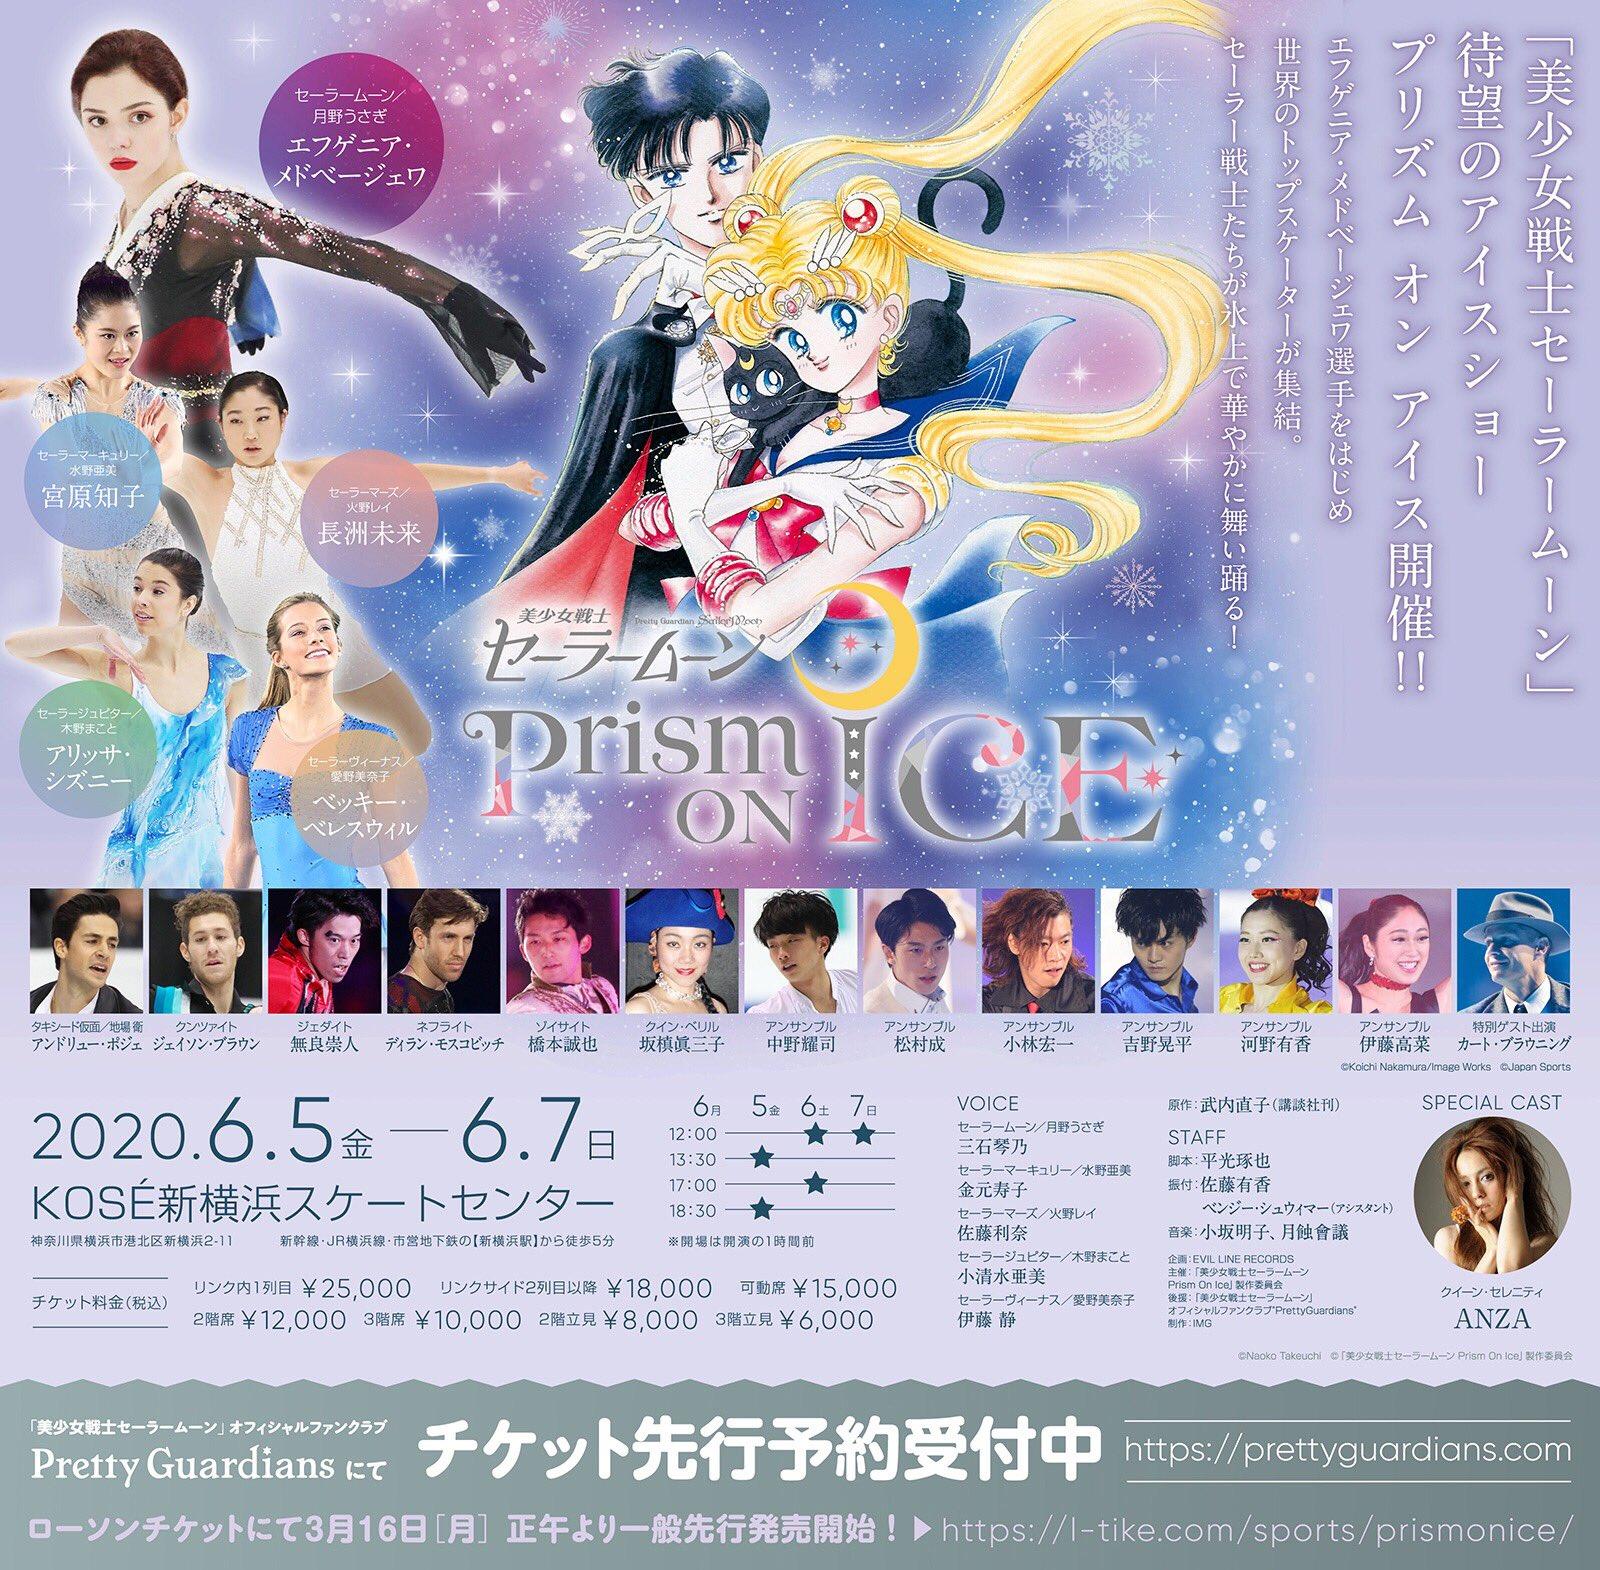 Sailor Moon ice show figure skating evgenia medvedeva